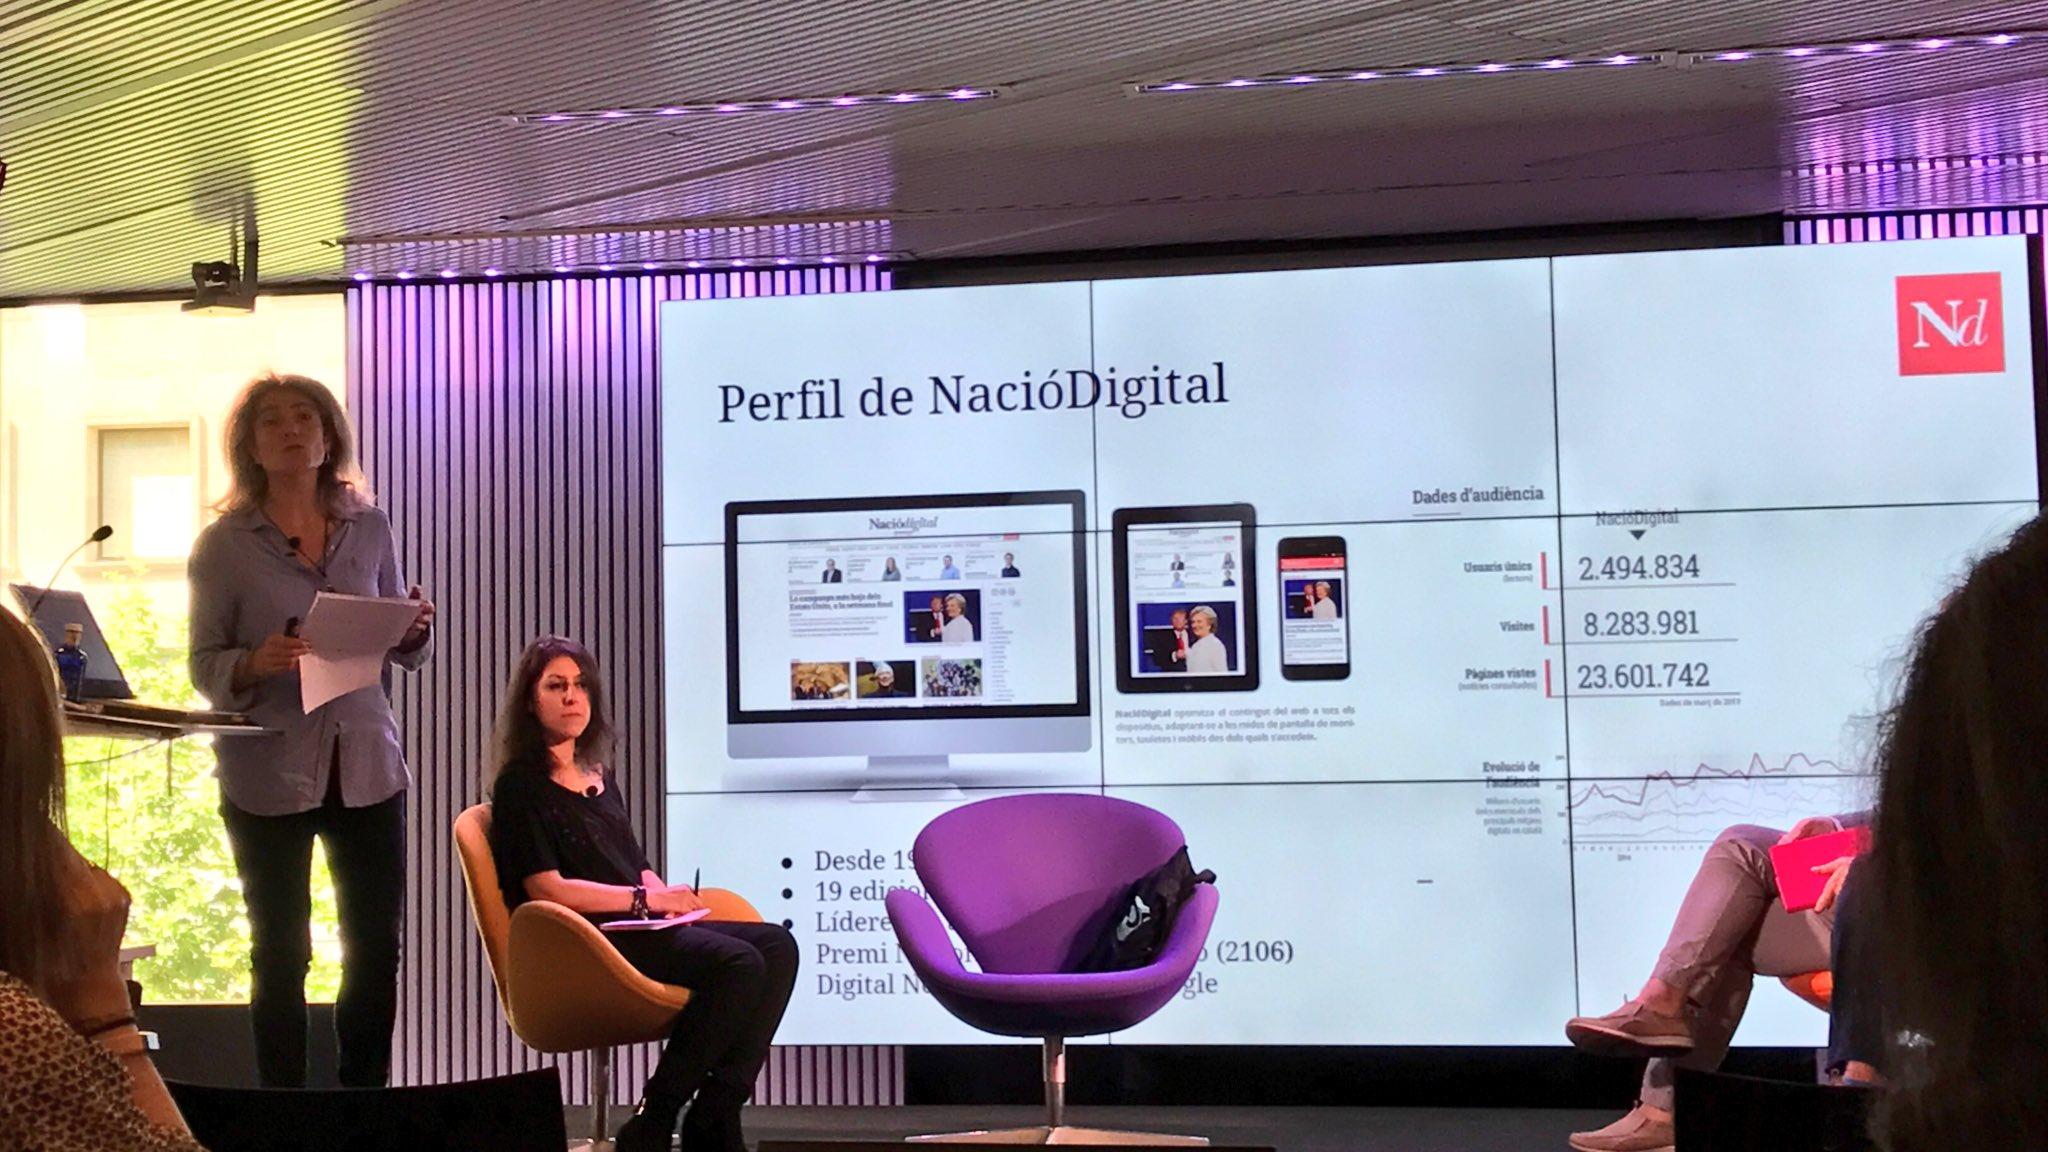 """Potenciamos el periodismo hiperlocal"", cuenta @kpeiro de @naciodigital. #MoJoBCN https://t.co/rtHtUarjj1"